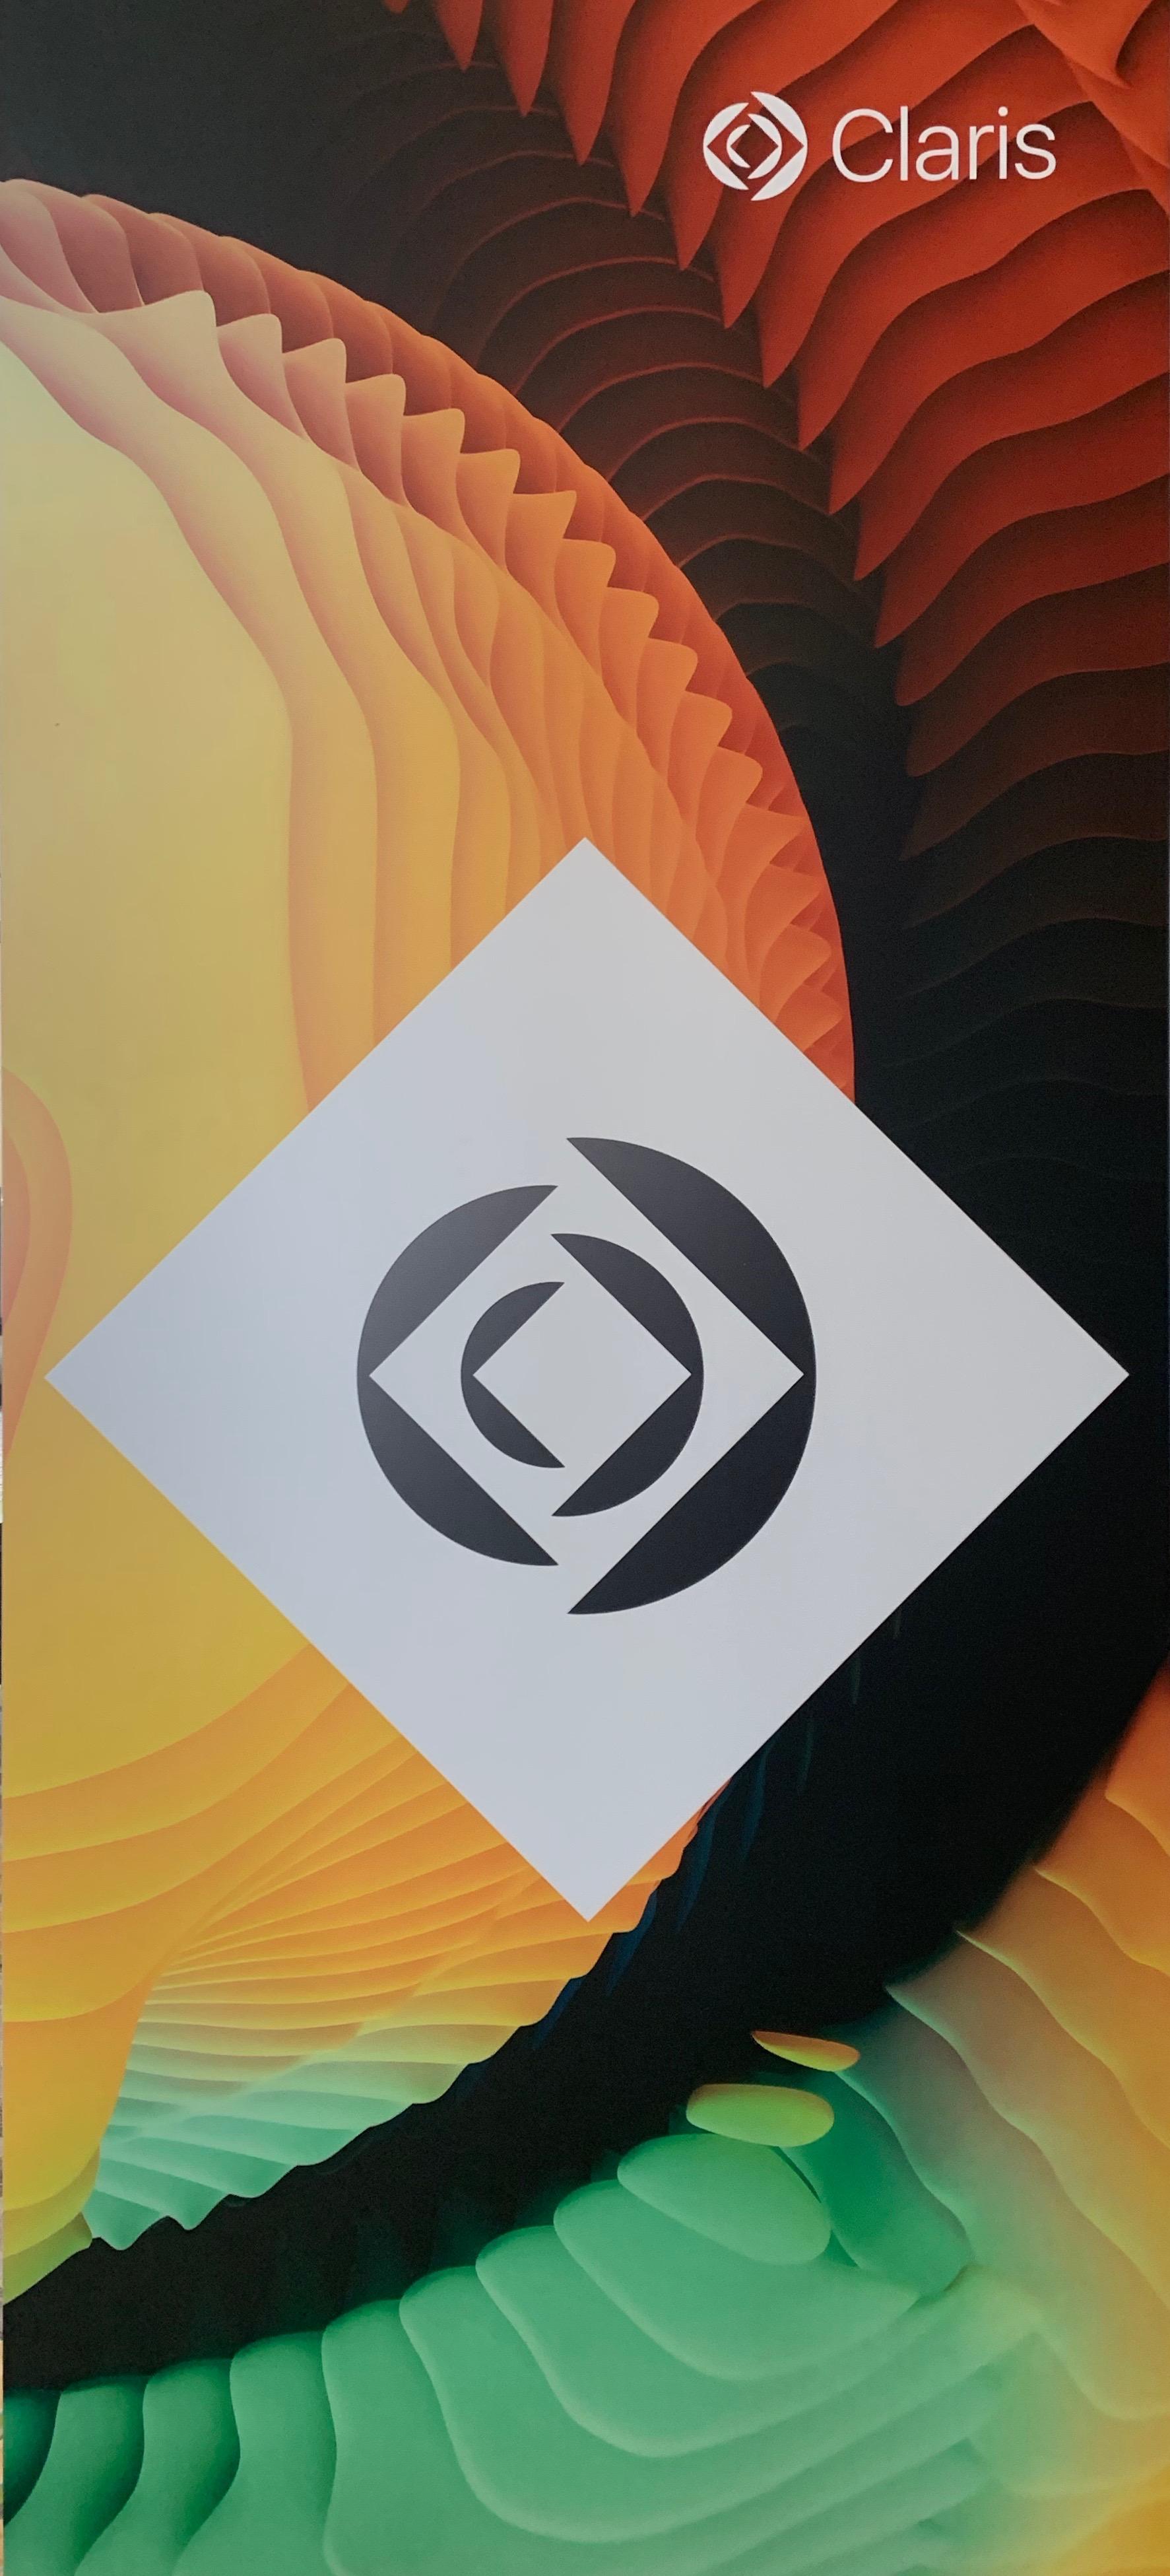 Claris new logo and art